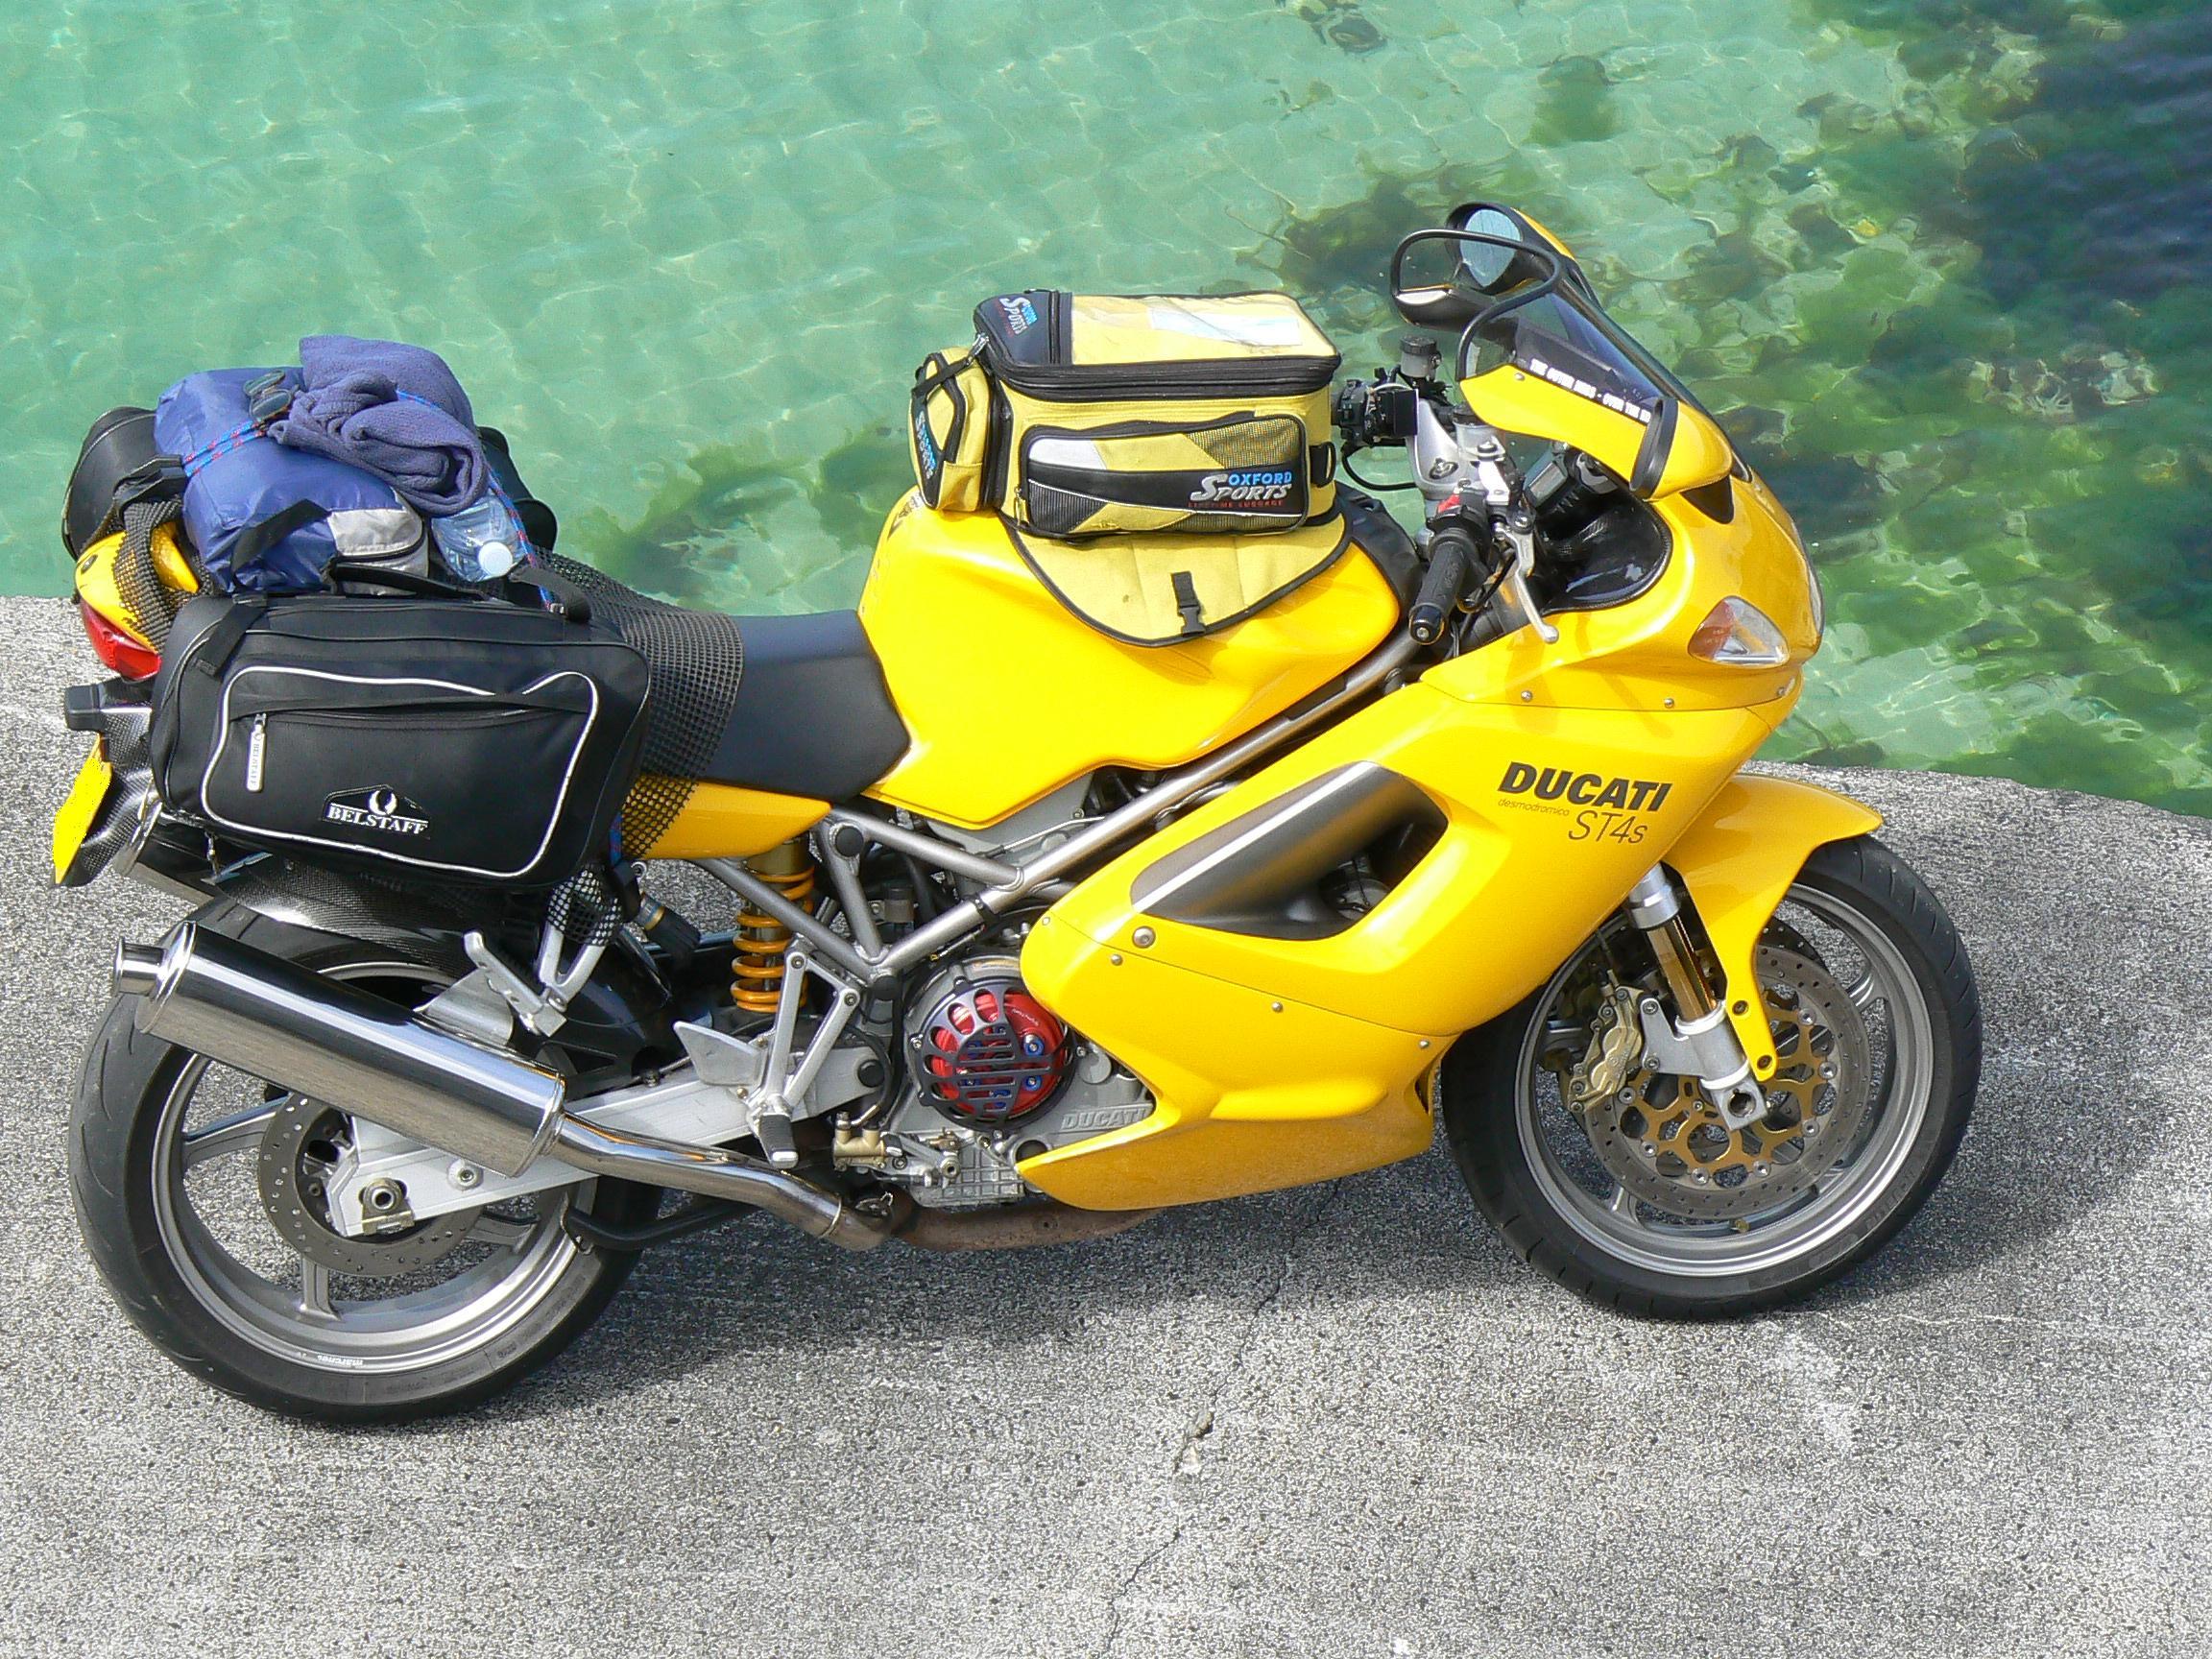 Yellow Ducati St4 999 Fuse Box Location With Bags Rh Signaturepedagogies Org Uk